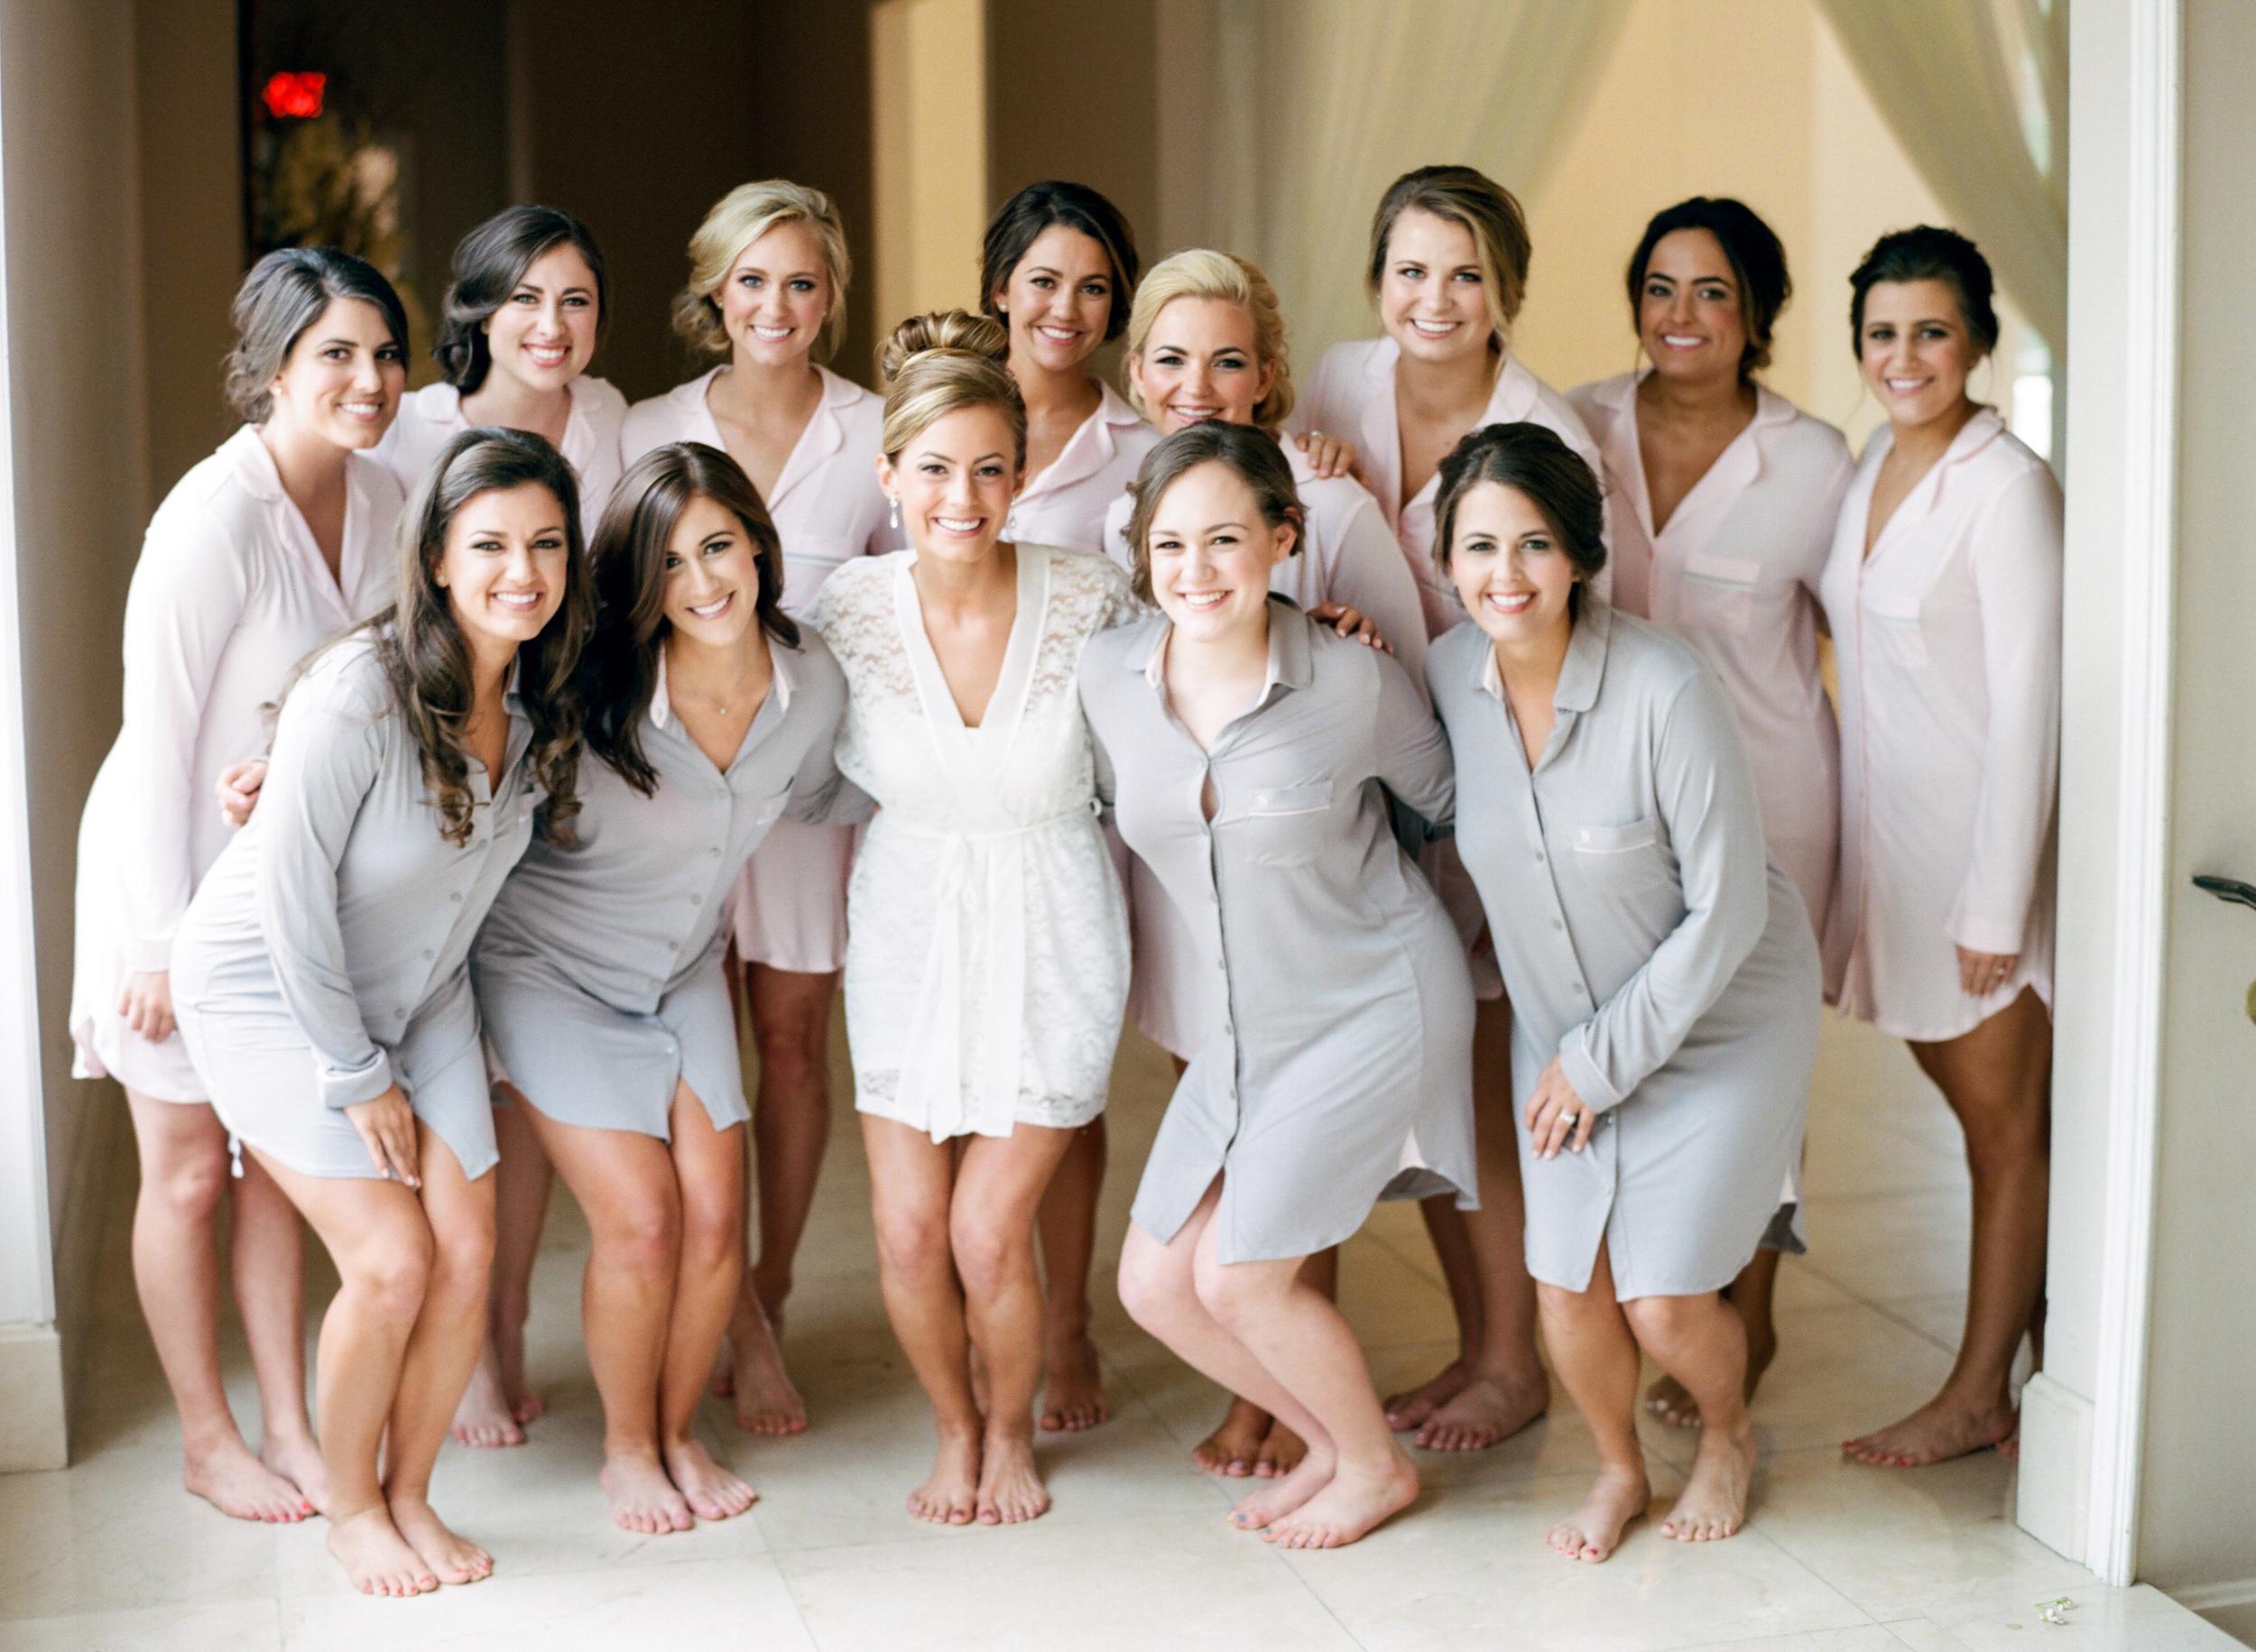 Dana-Fernandez-Photography-Houston-Wedding-Photographer-Style-Me-Pretty-Film-Texas-Destination-Photographer-4.jpg